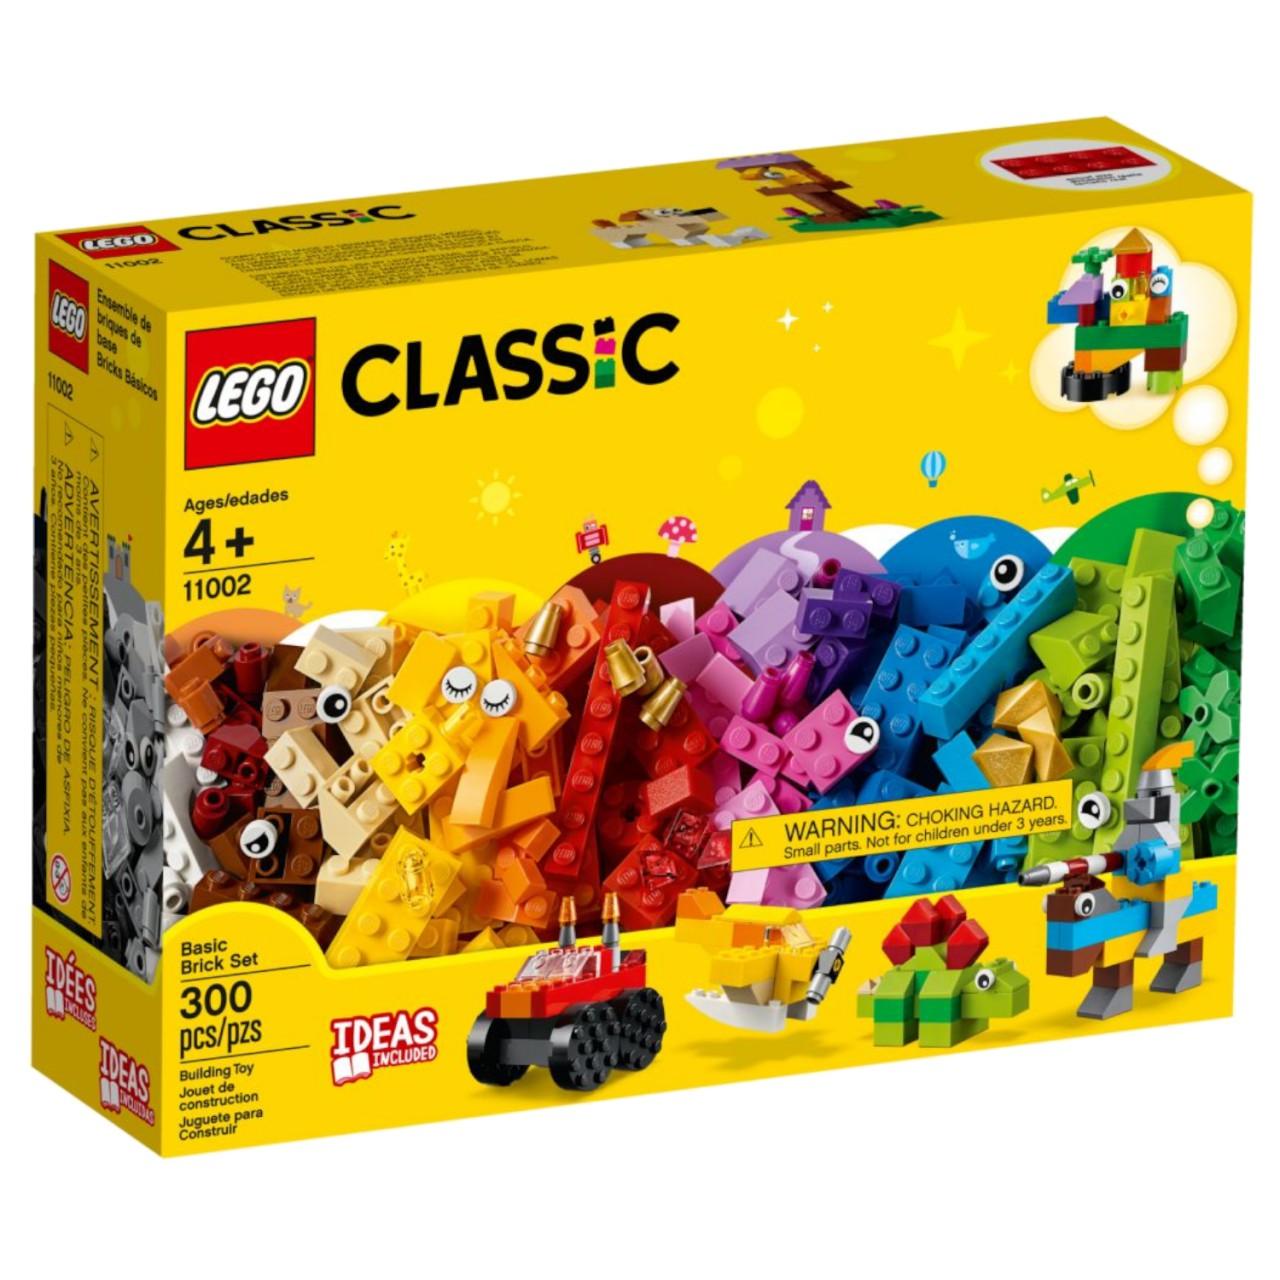 LEGO CLASSIC 11002 Bausteine